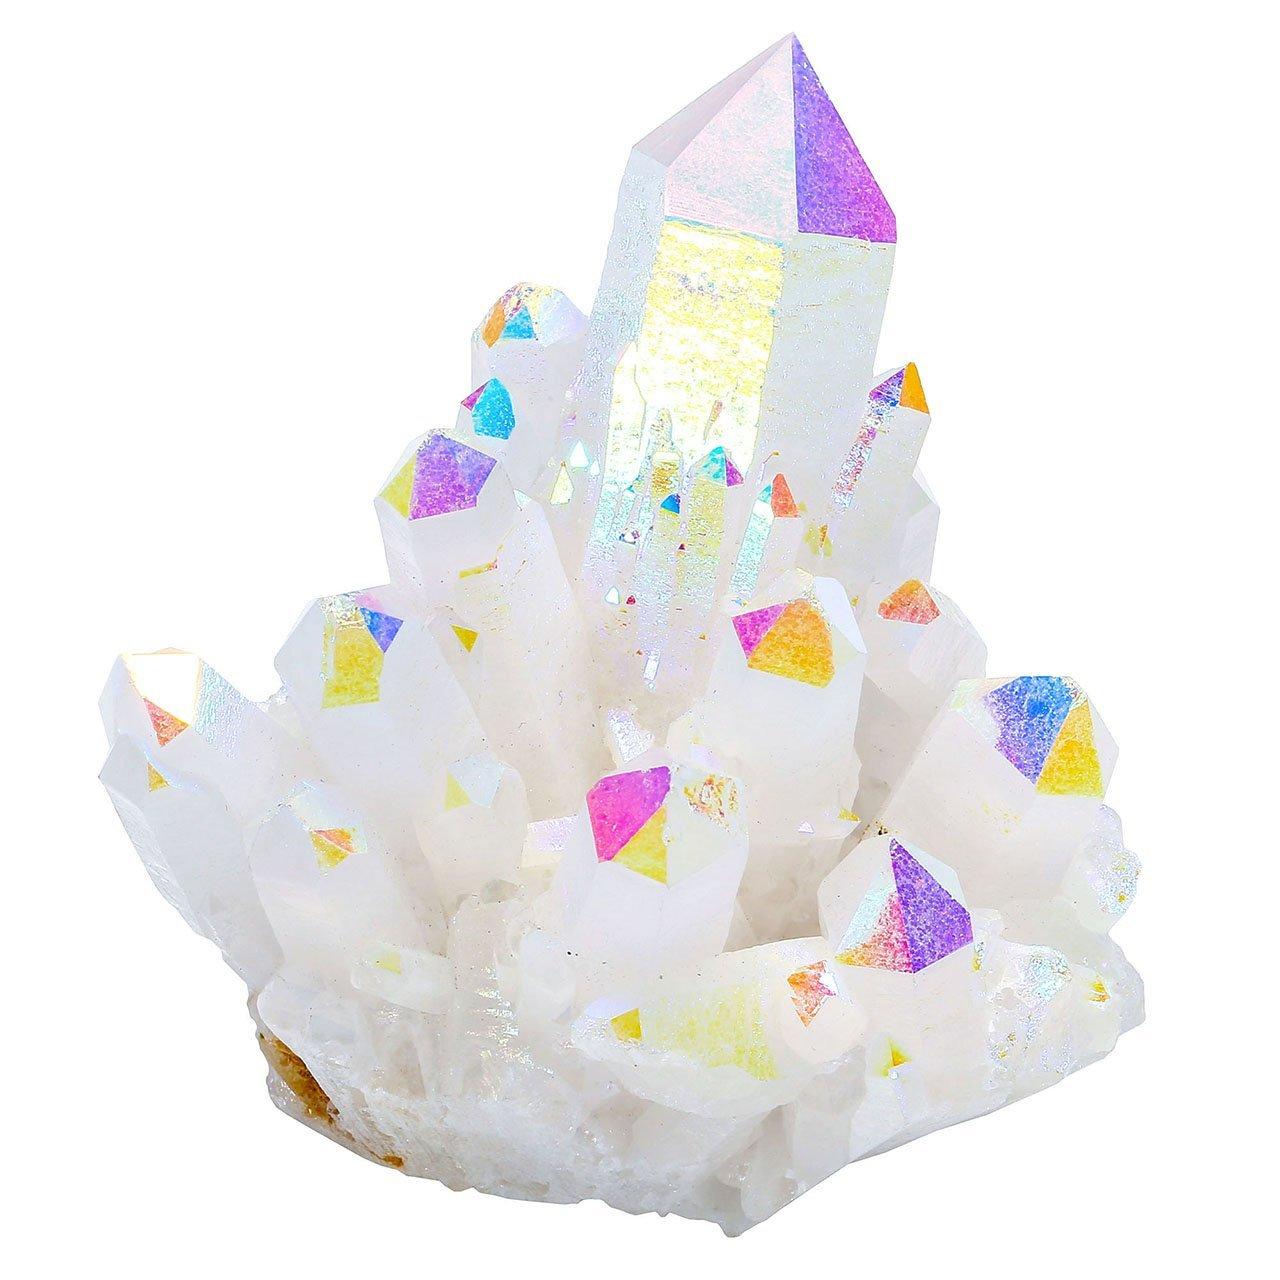 magic unicorn grown-up ways to try the trend rainbow crystals quartz